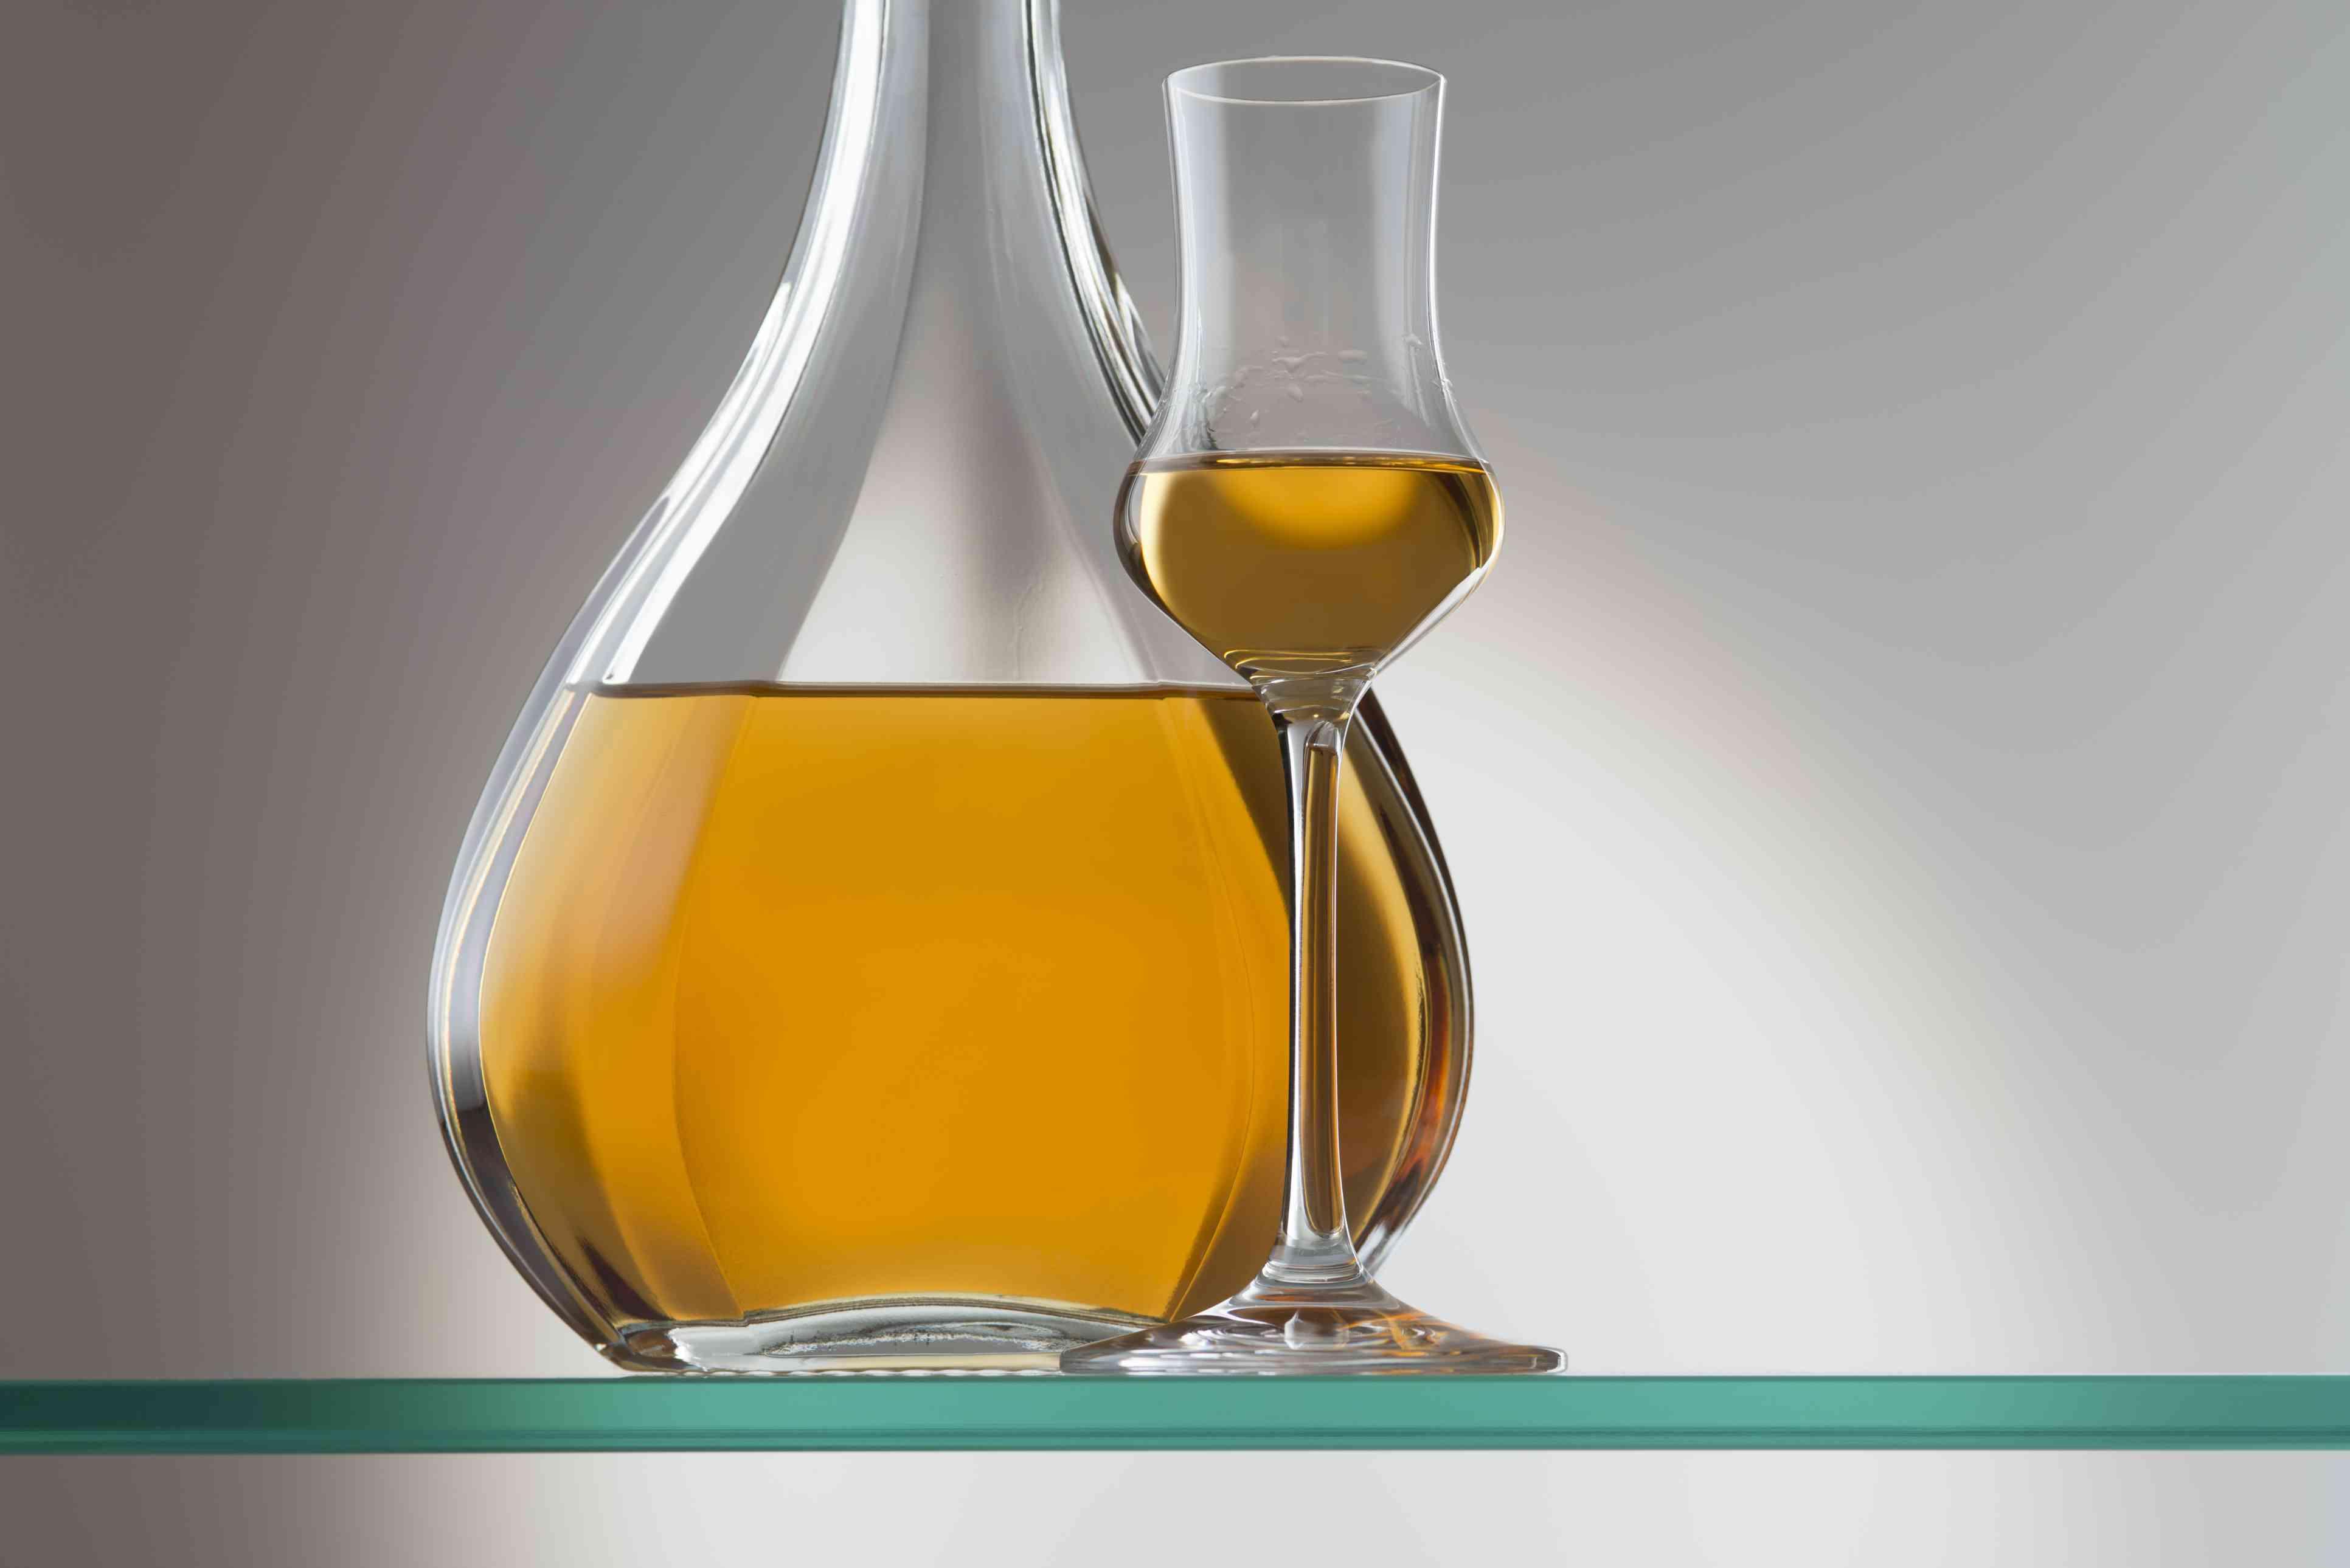 brandy bottle and aperitif glass